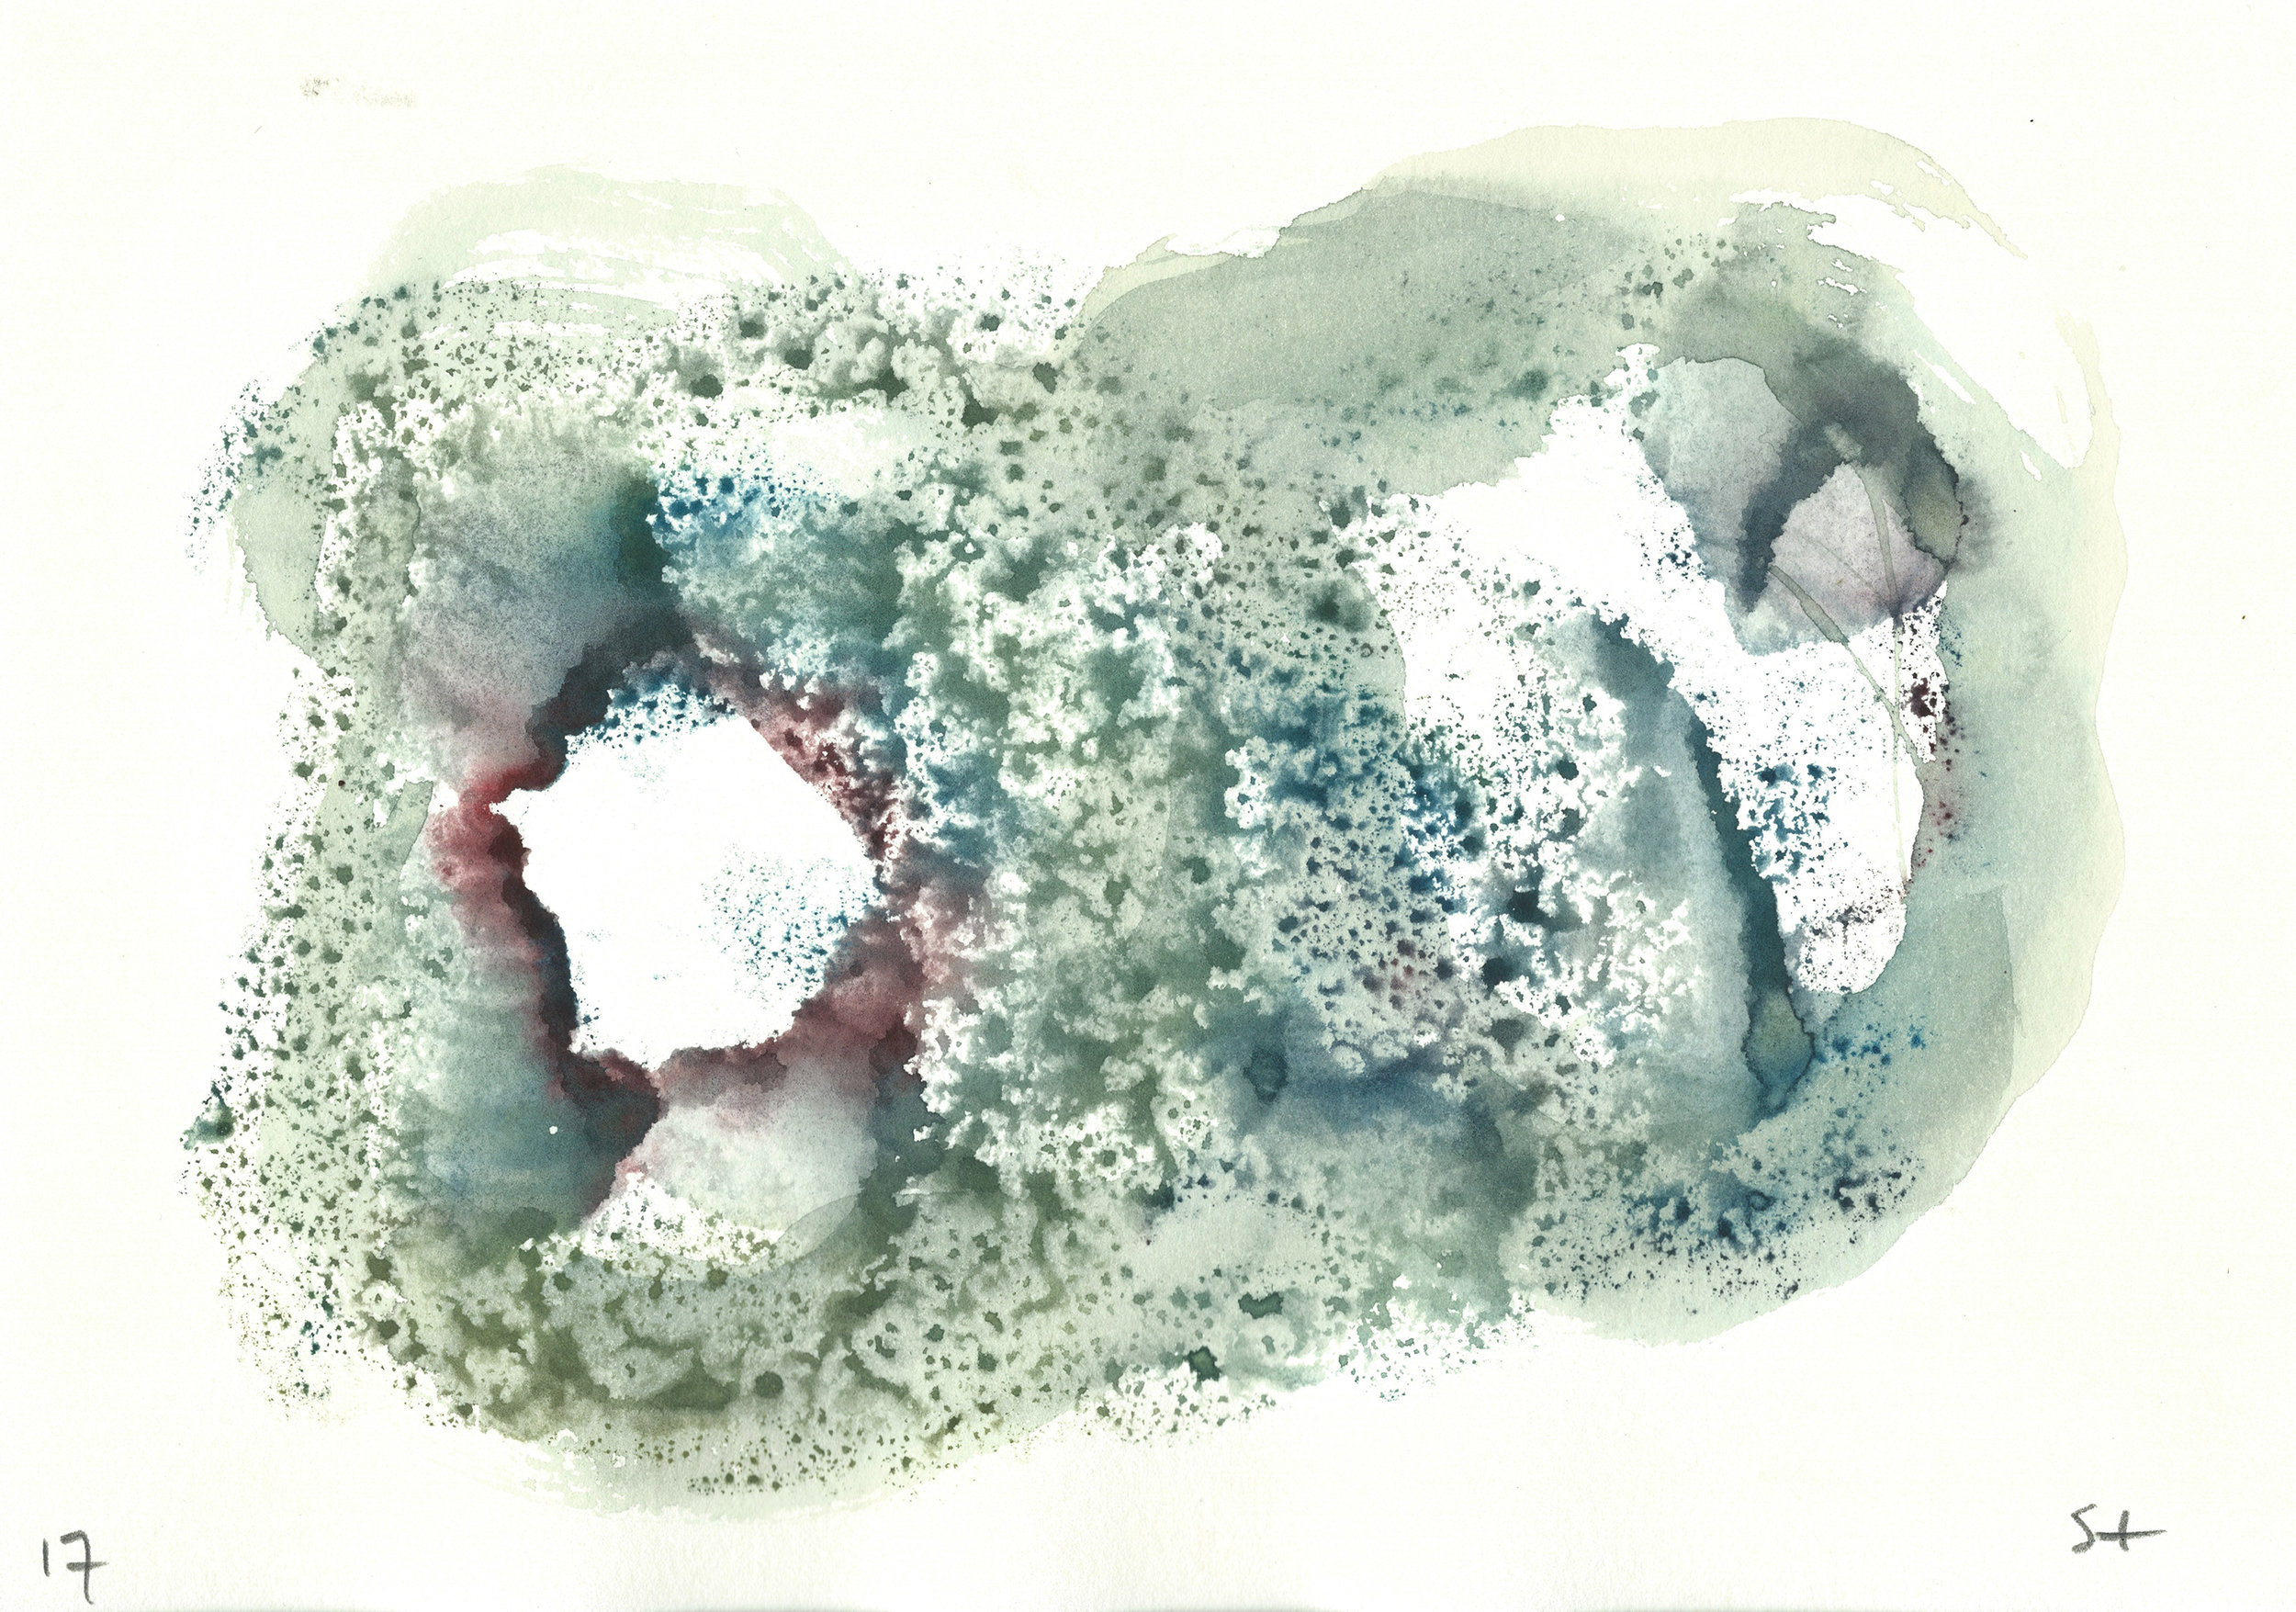 Stephen Thomas, Yoga, Yoga-Svarupa, watercolor 04